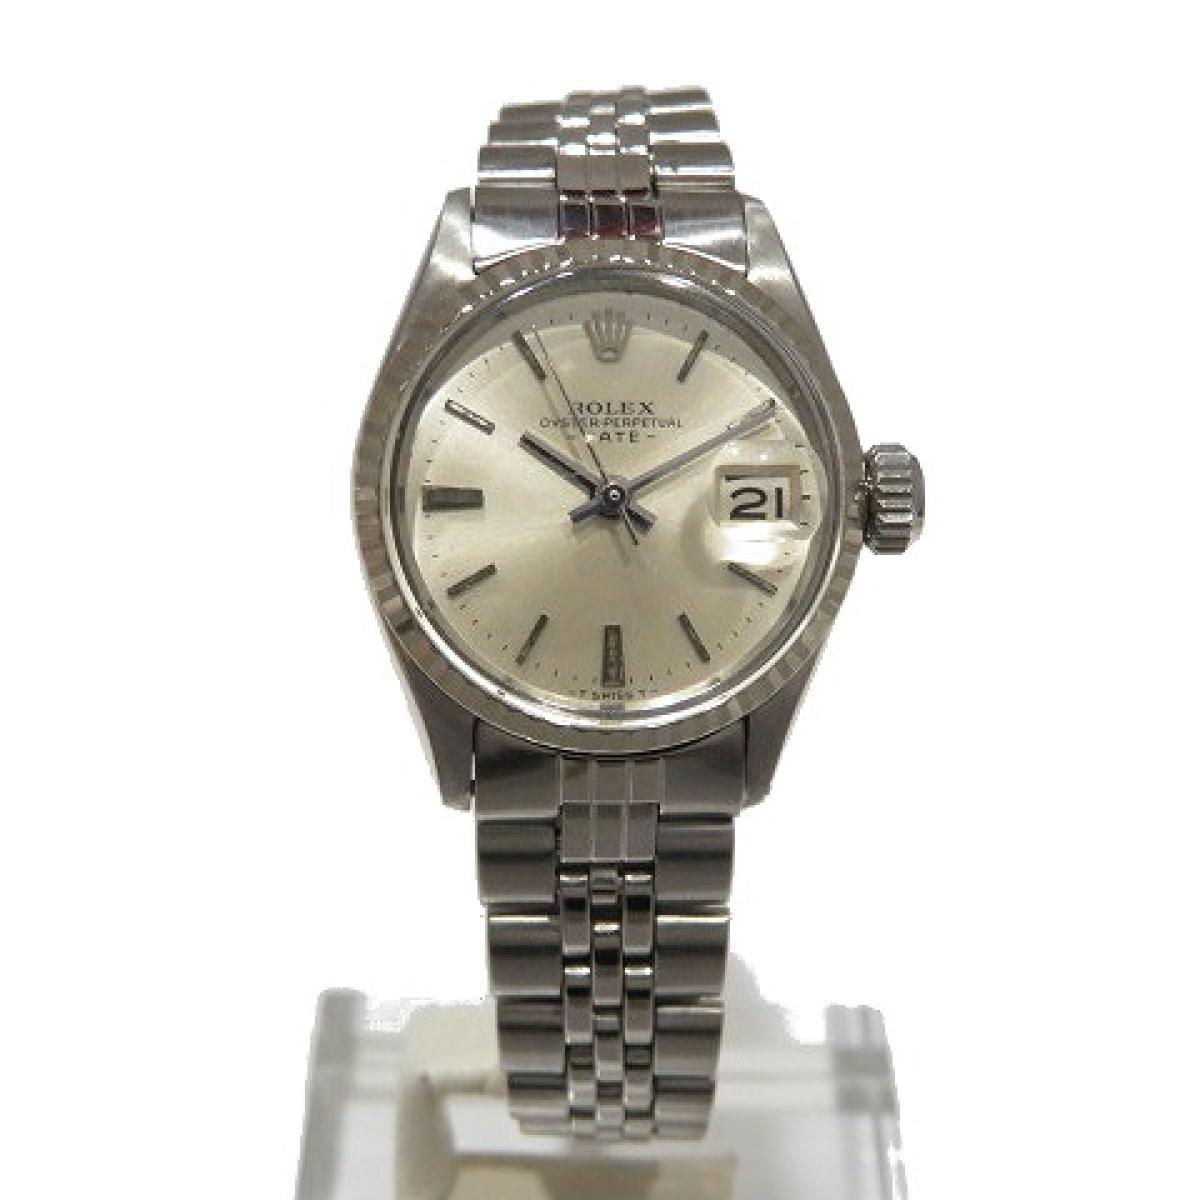 ROLEX 時計 6517 デイト ウォッチ 腕時計/SALE/お買得品